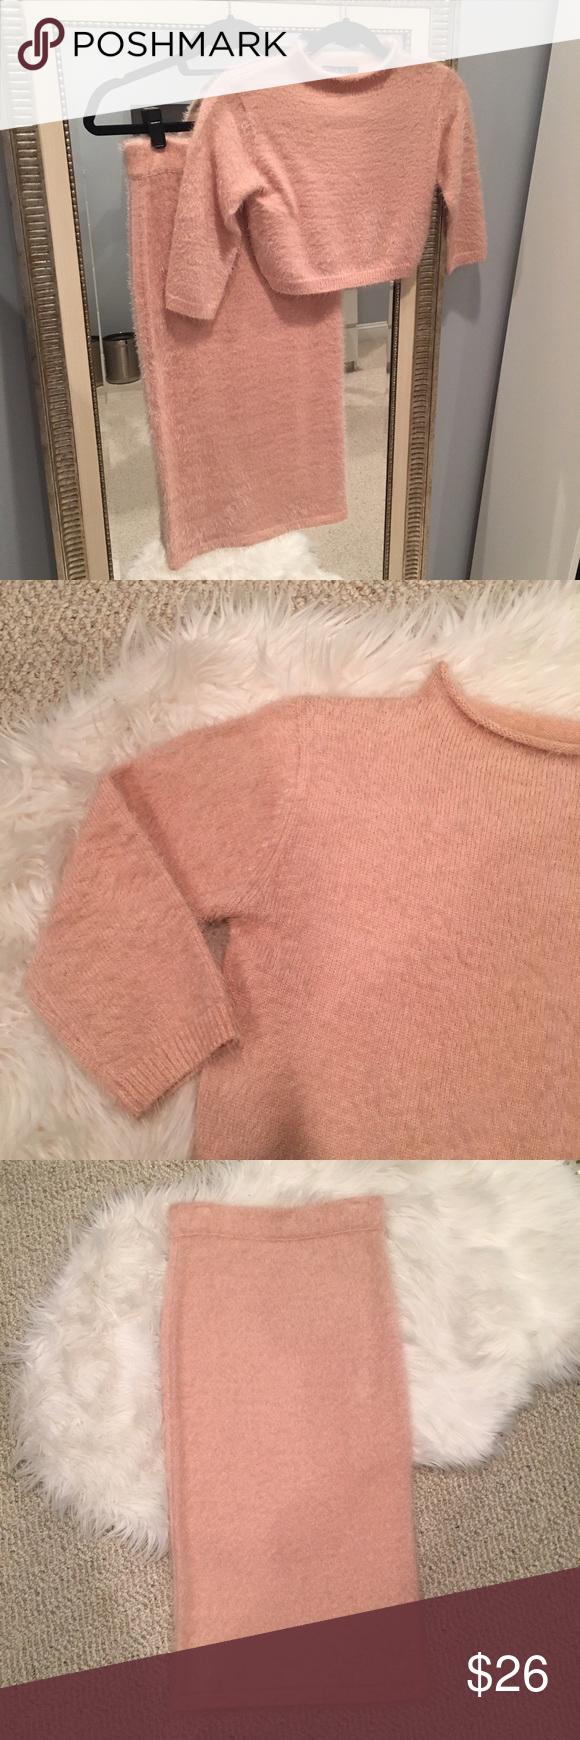 Fuzzy Blush Pink 2 Piece Sweater Dress Set My Posh Picks